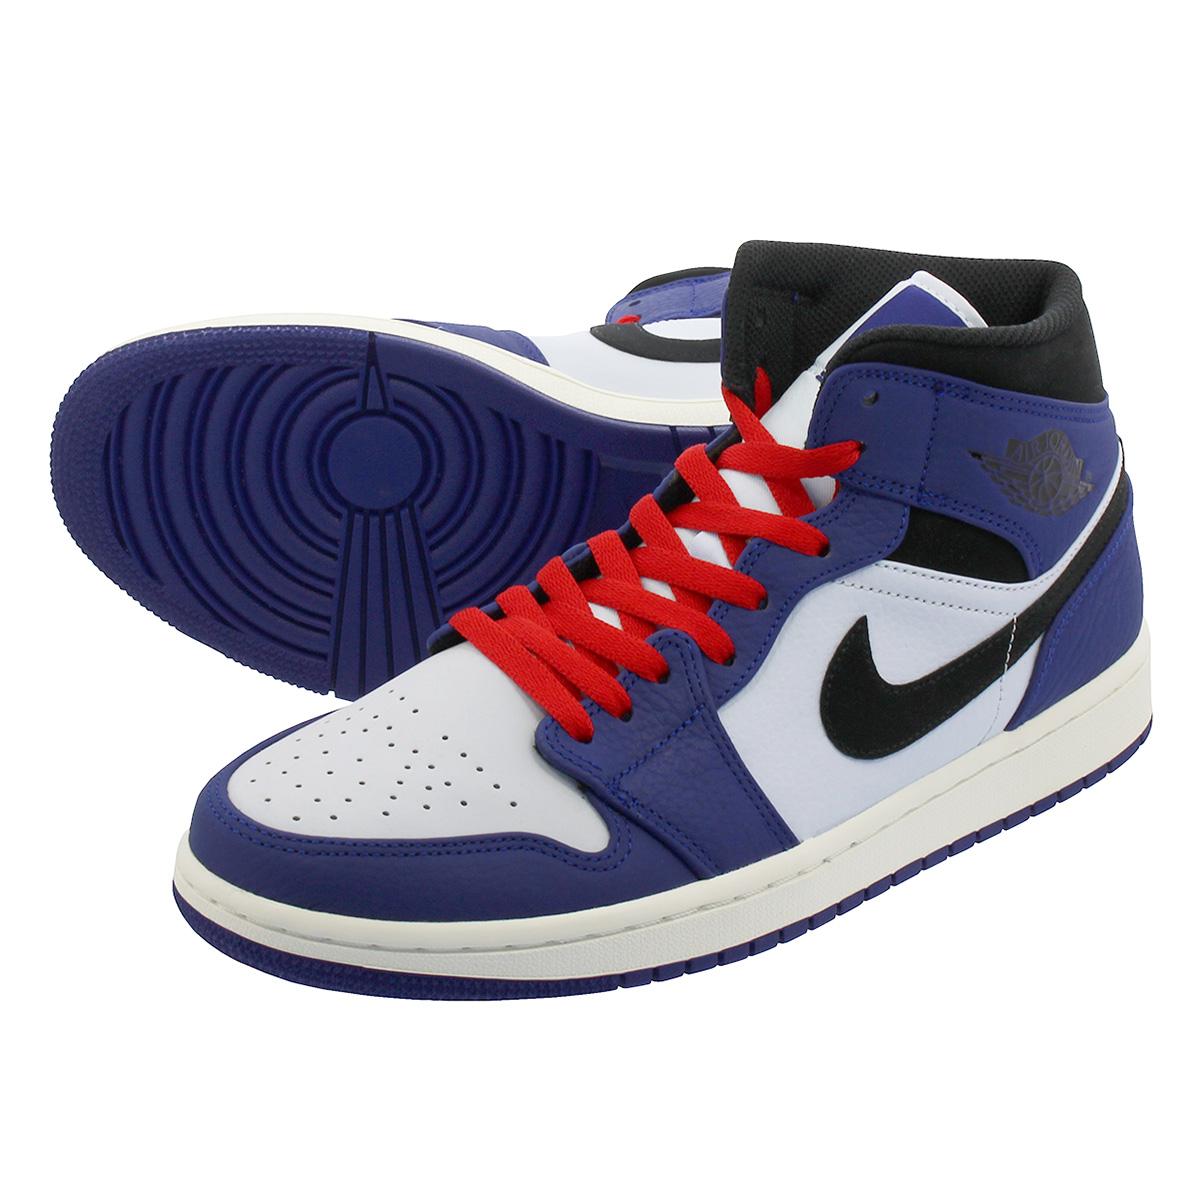 196be43401c LOWTEX PLUS  NIKE AIR JORDAN 1 MID SE Nike Air Jordan 1 mid SE DEEP ROYAL  BLUE BLACK 852